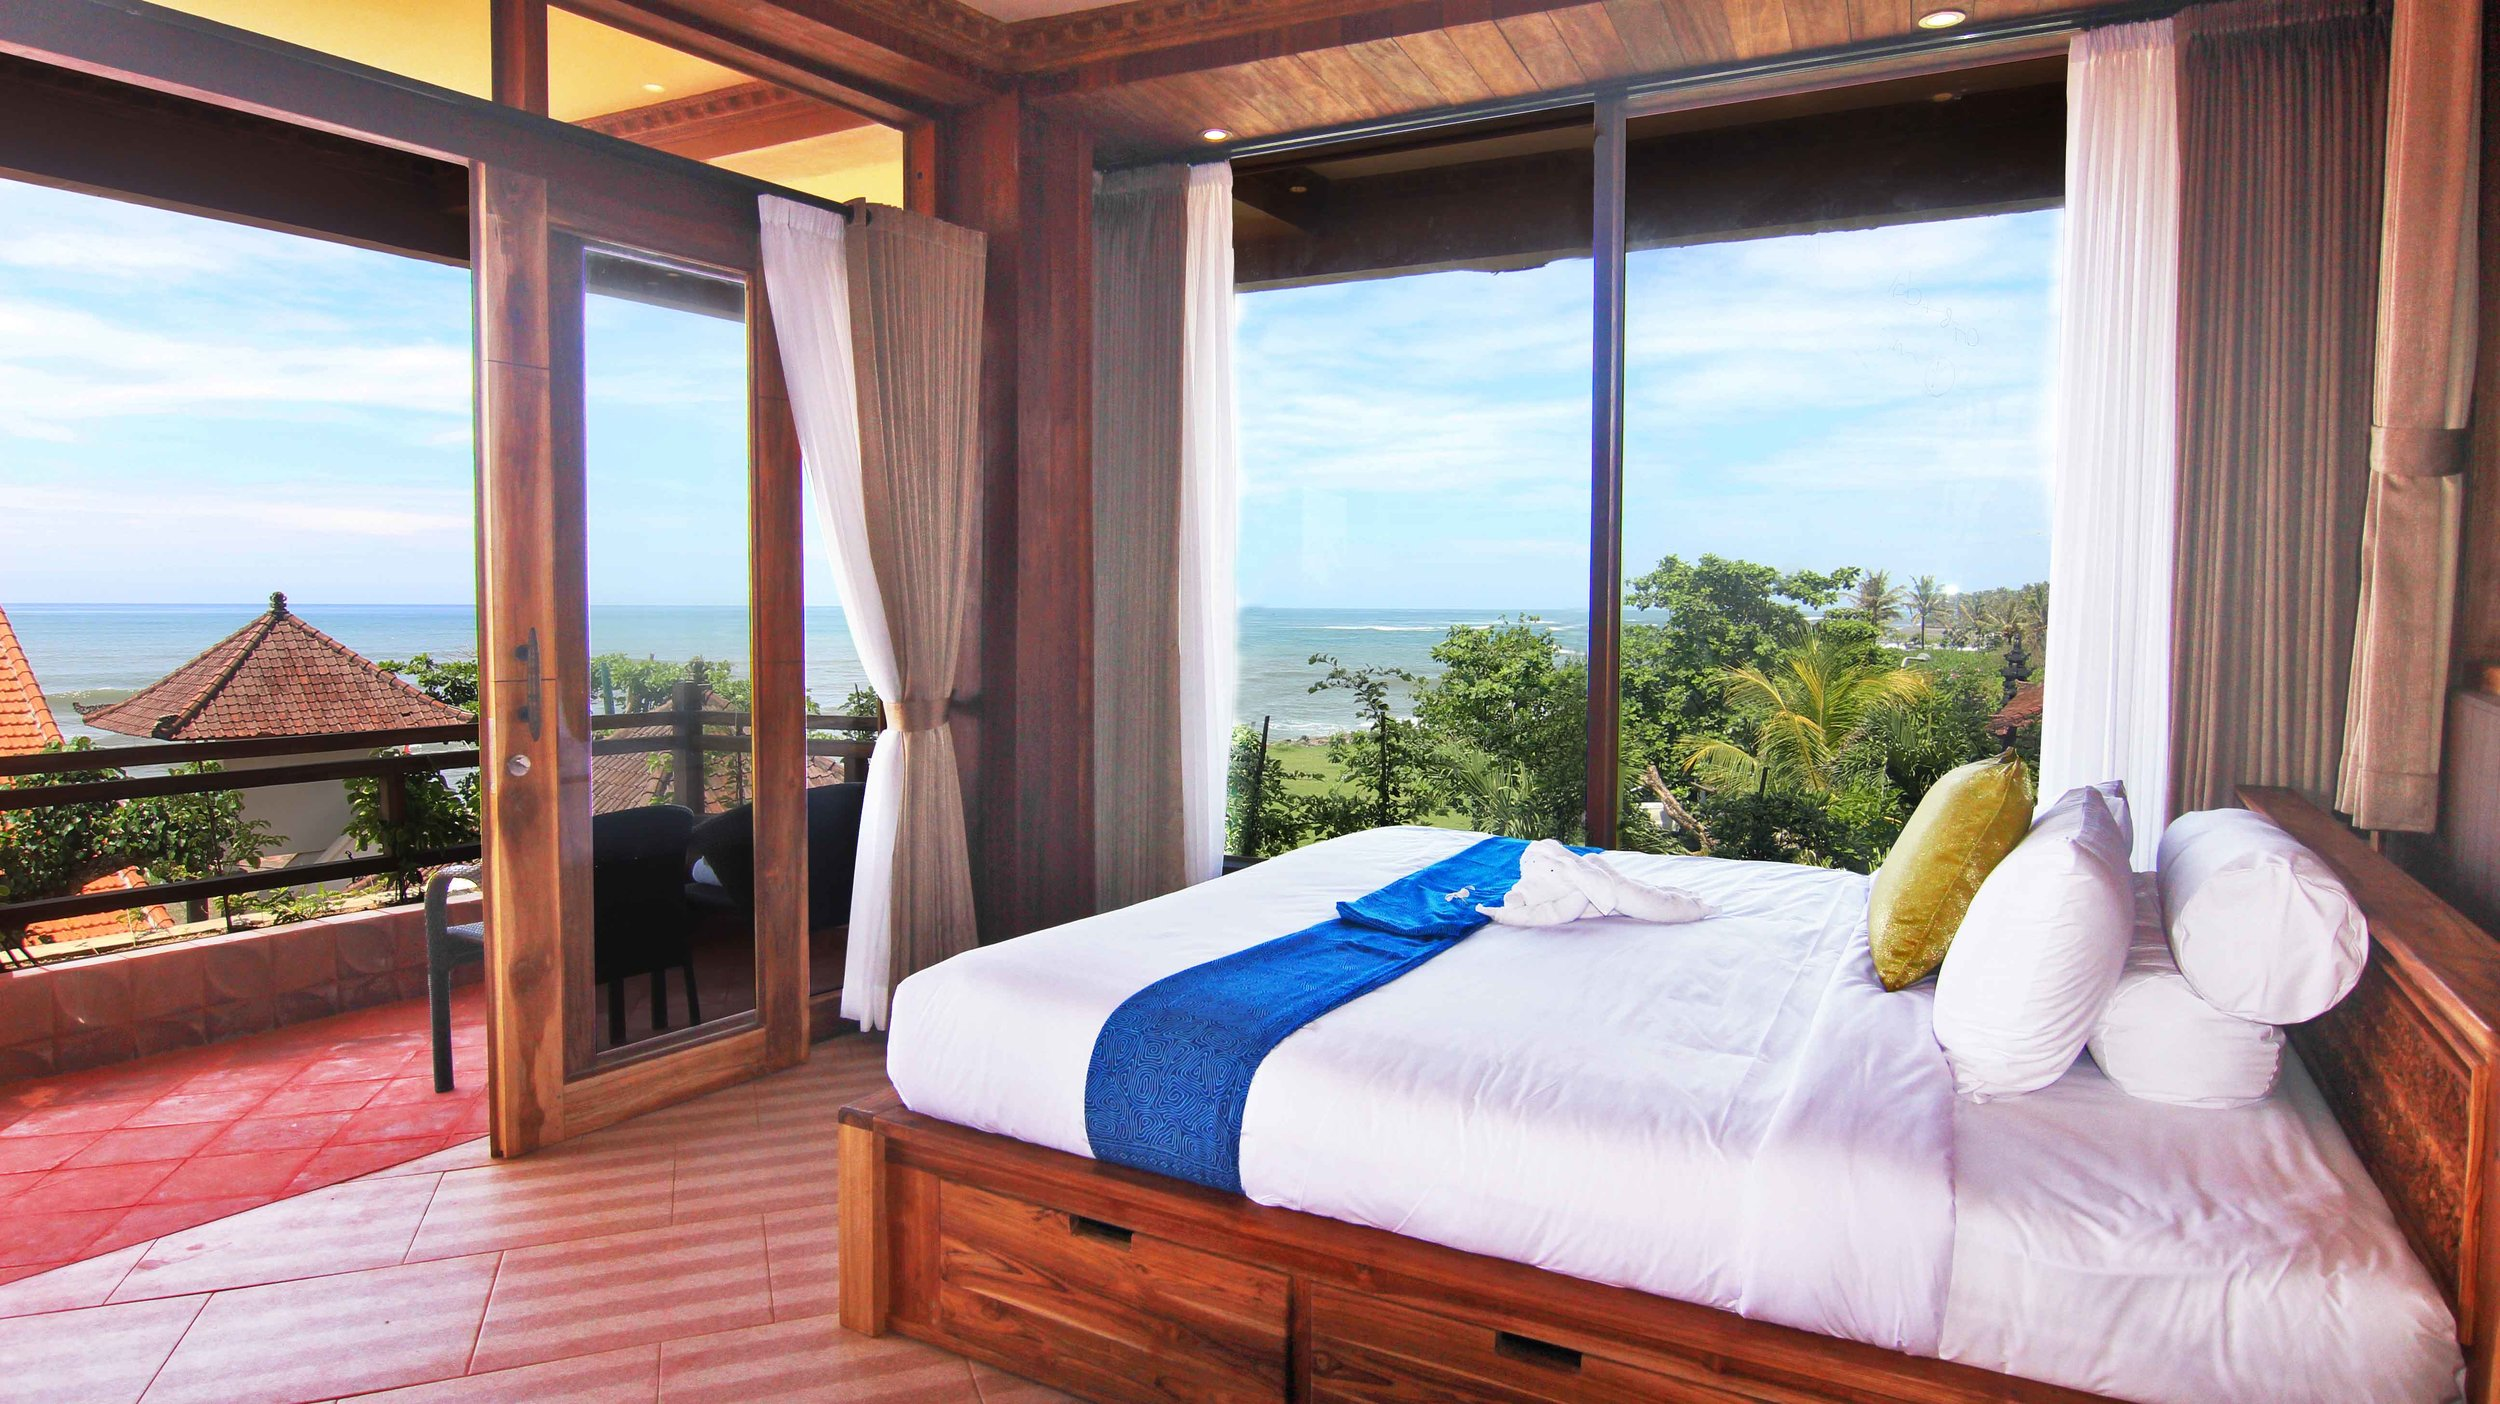 room-cheap-sale-room-discount-hot-deal-cheap-room---ocean-view-rooftop---nice-view.jpg